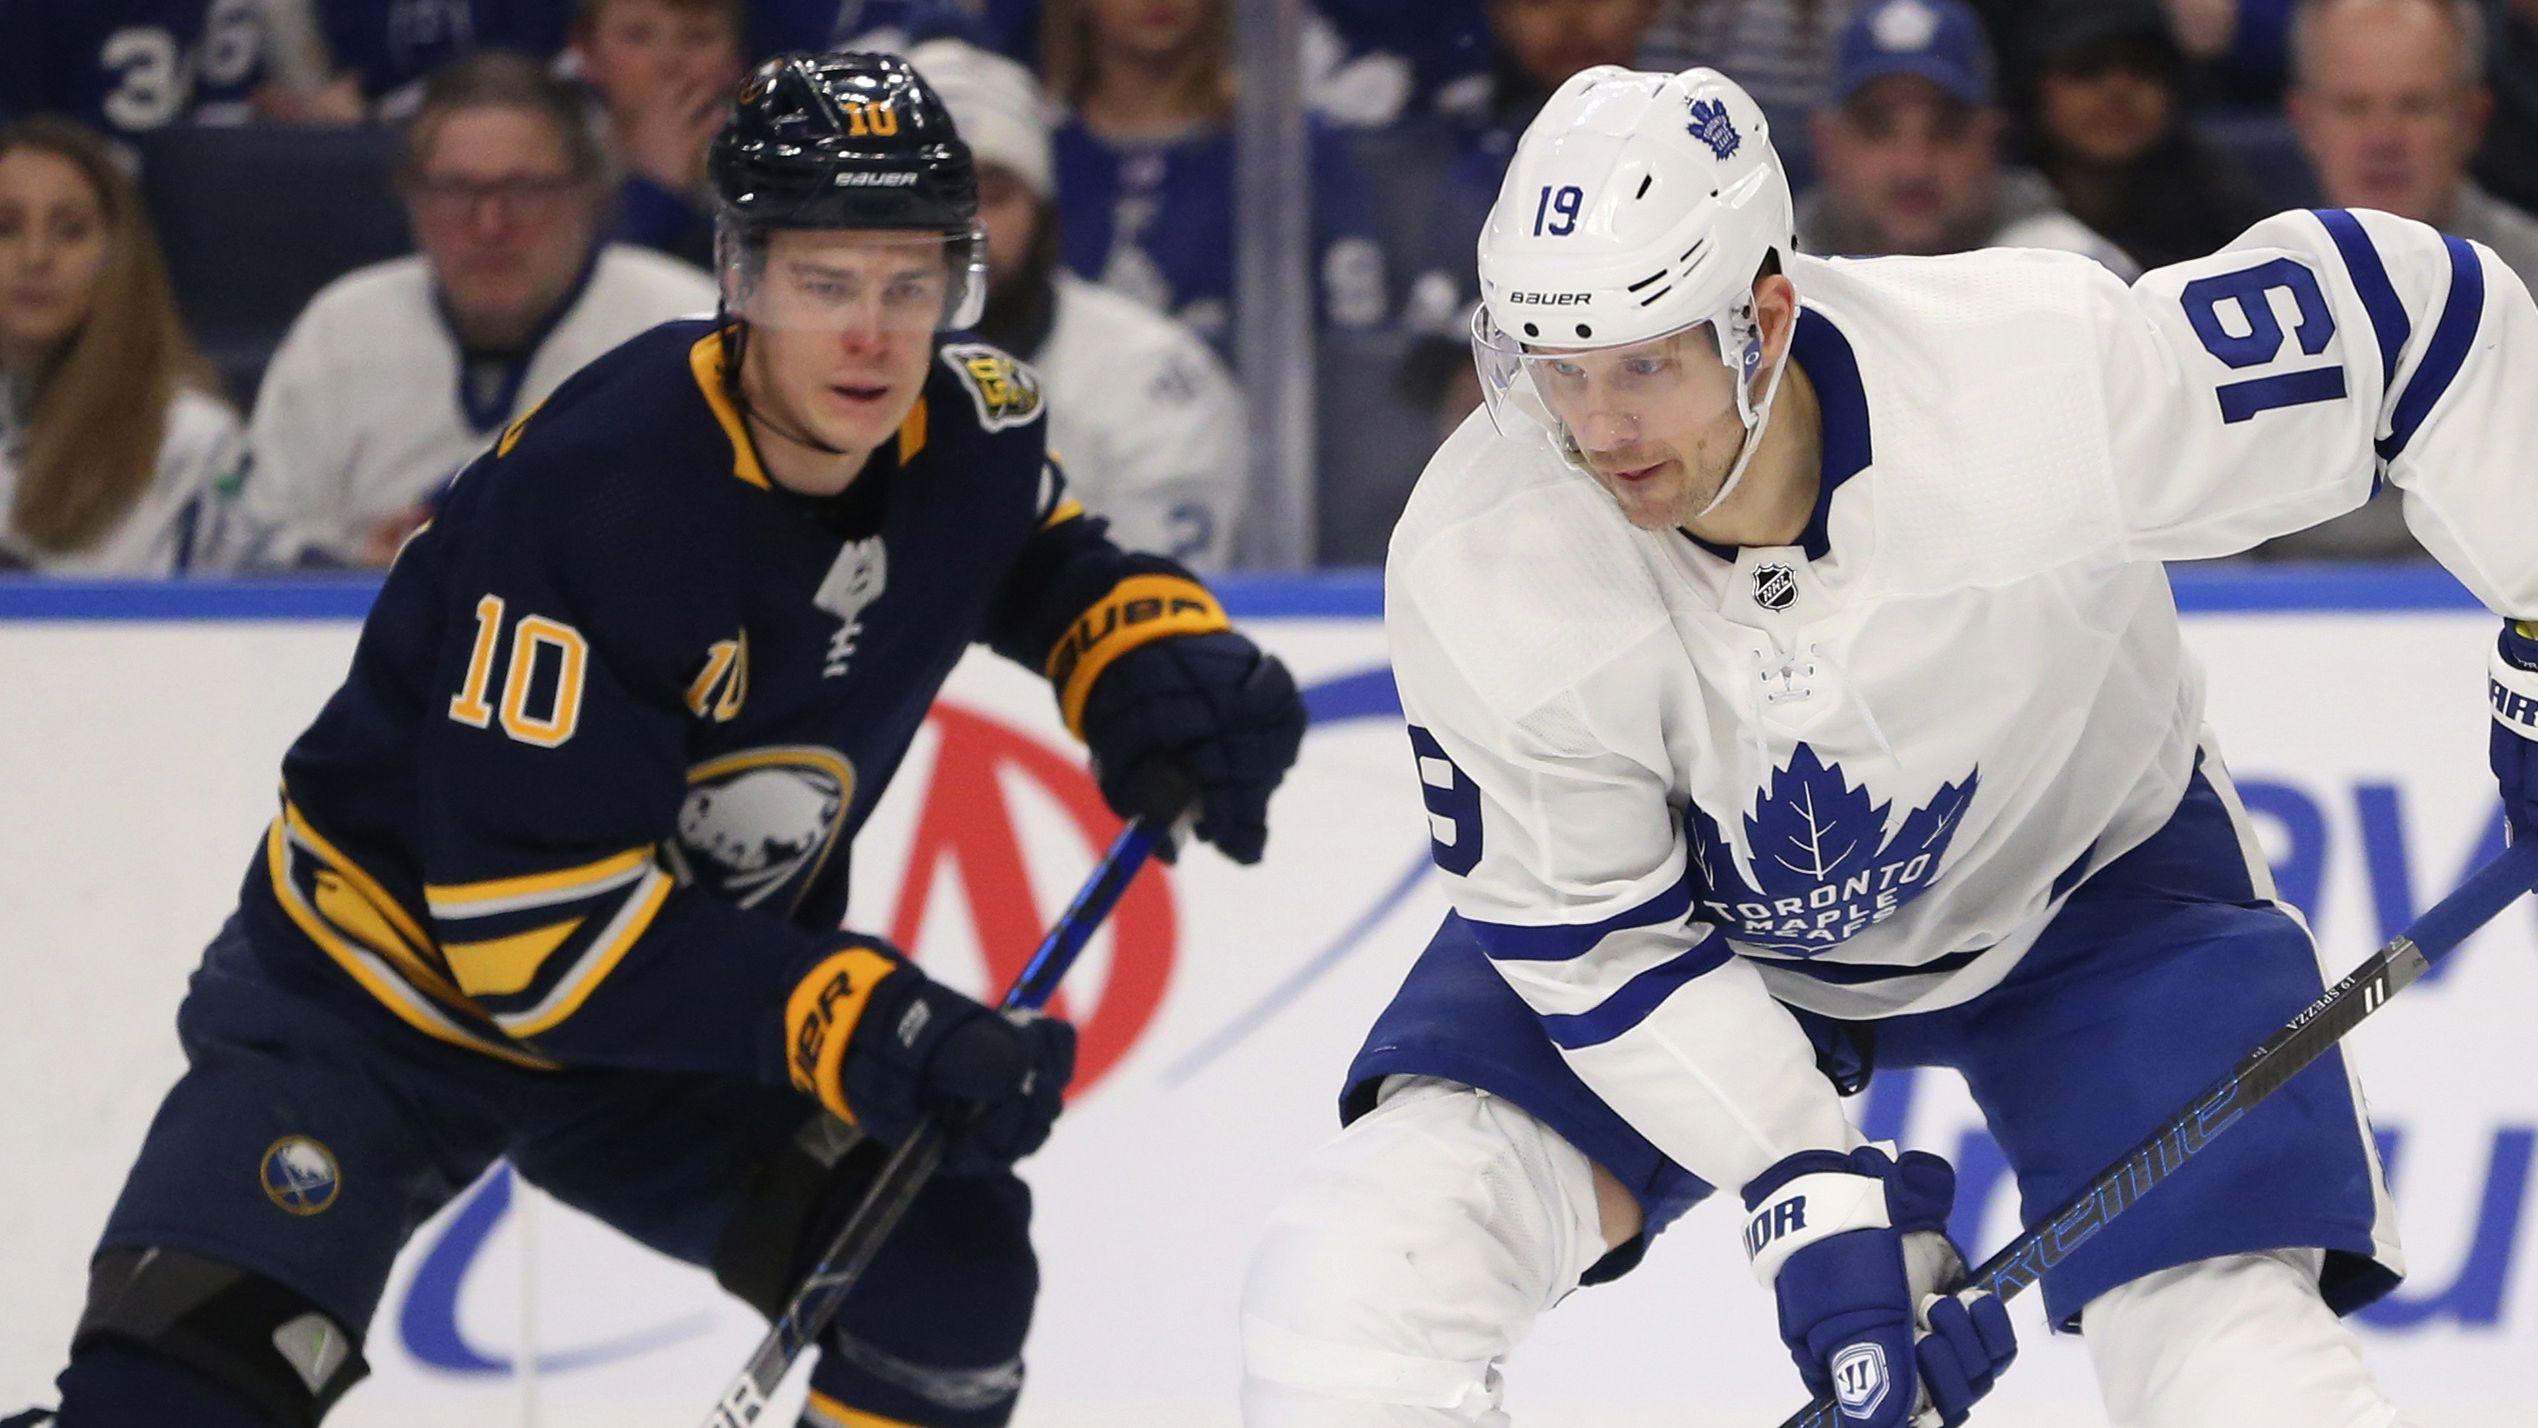 NHL, NHLPA agree on protocols to resume season